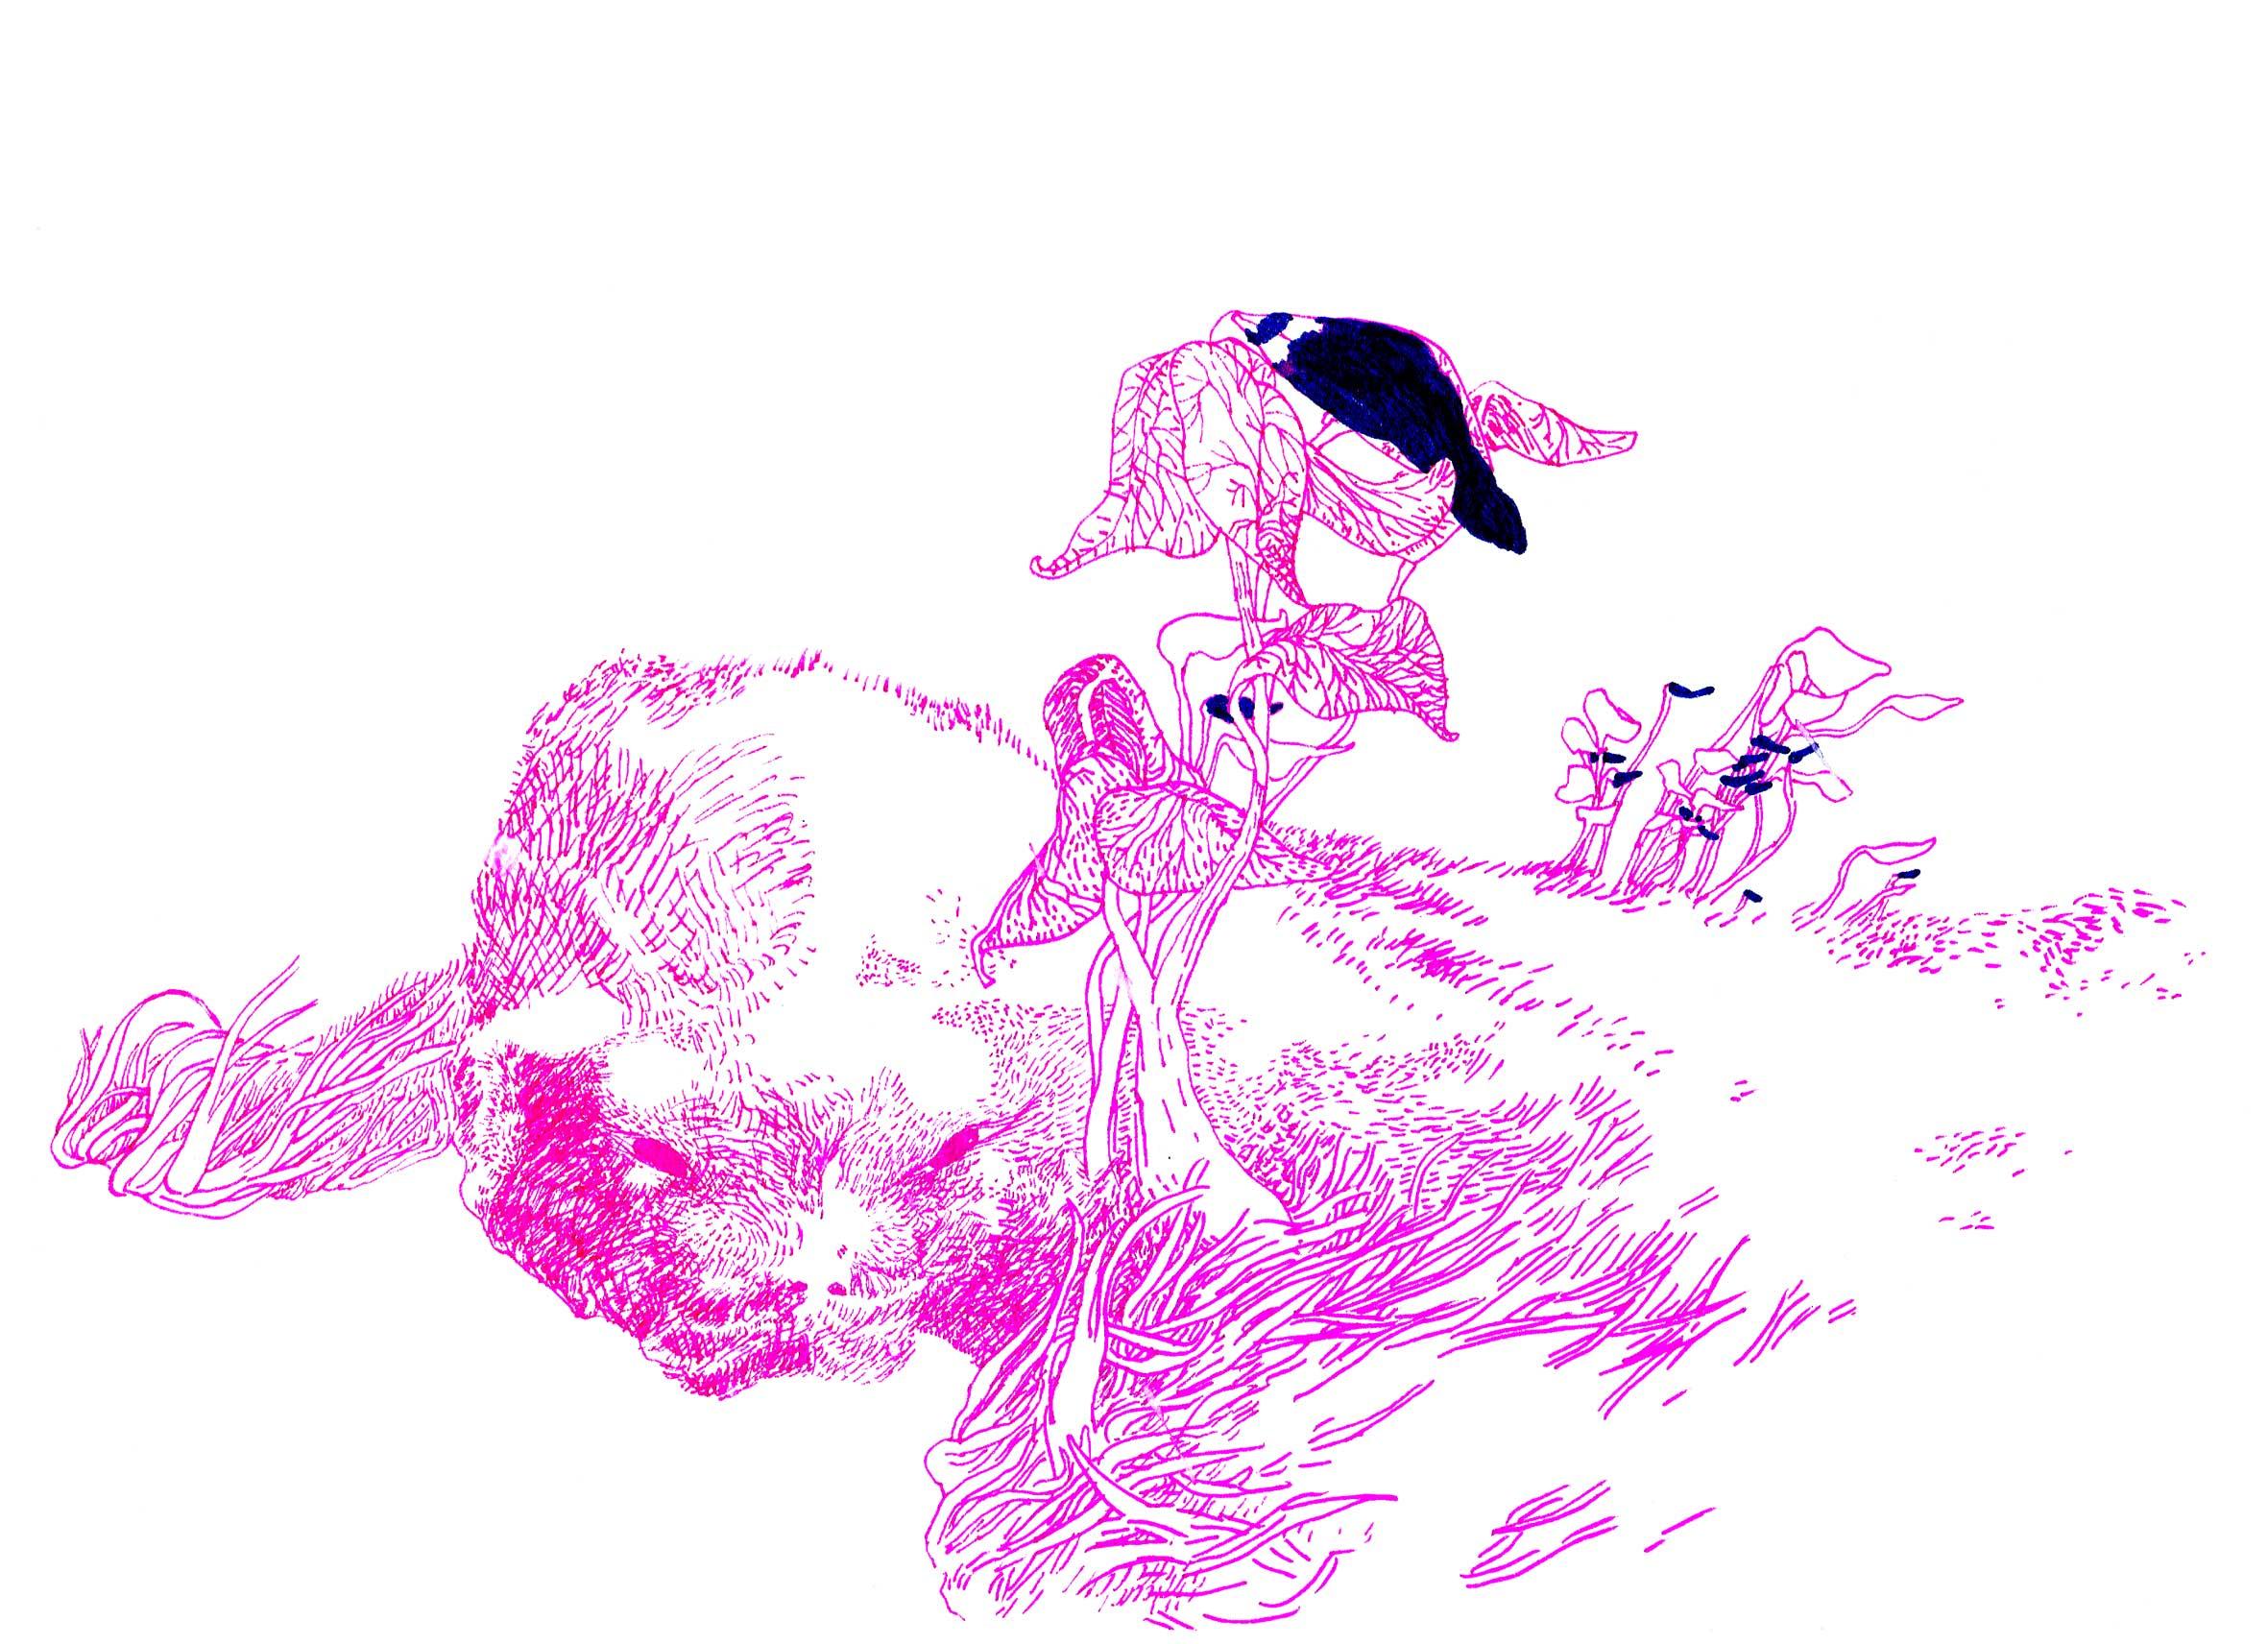 31f49b29eb6 Paysage (Sarah Debove) - L Improbable ImproBlog d Emmanuel Savoye ...